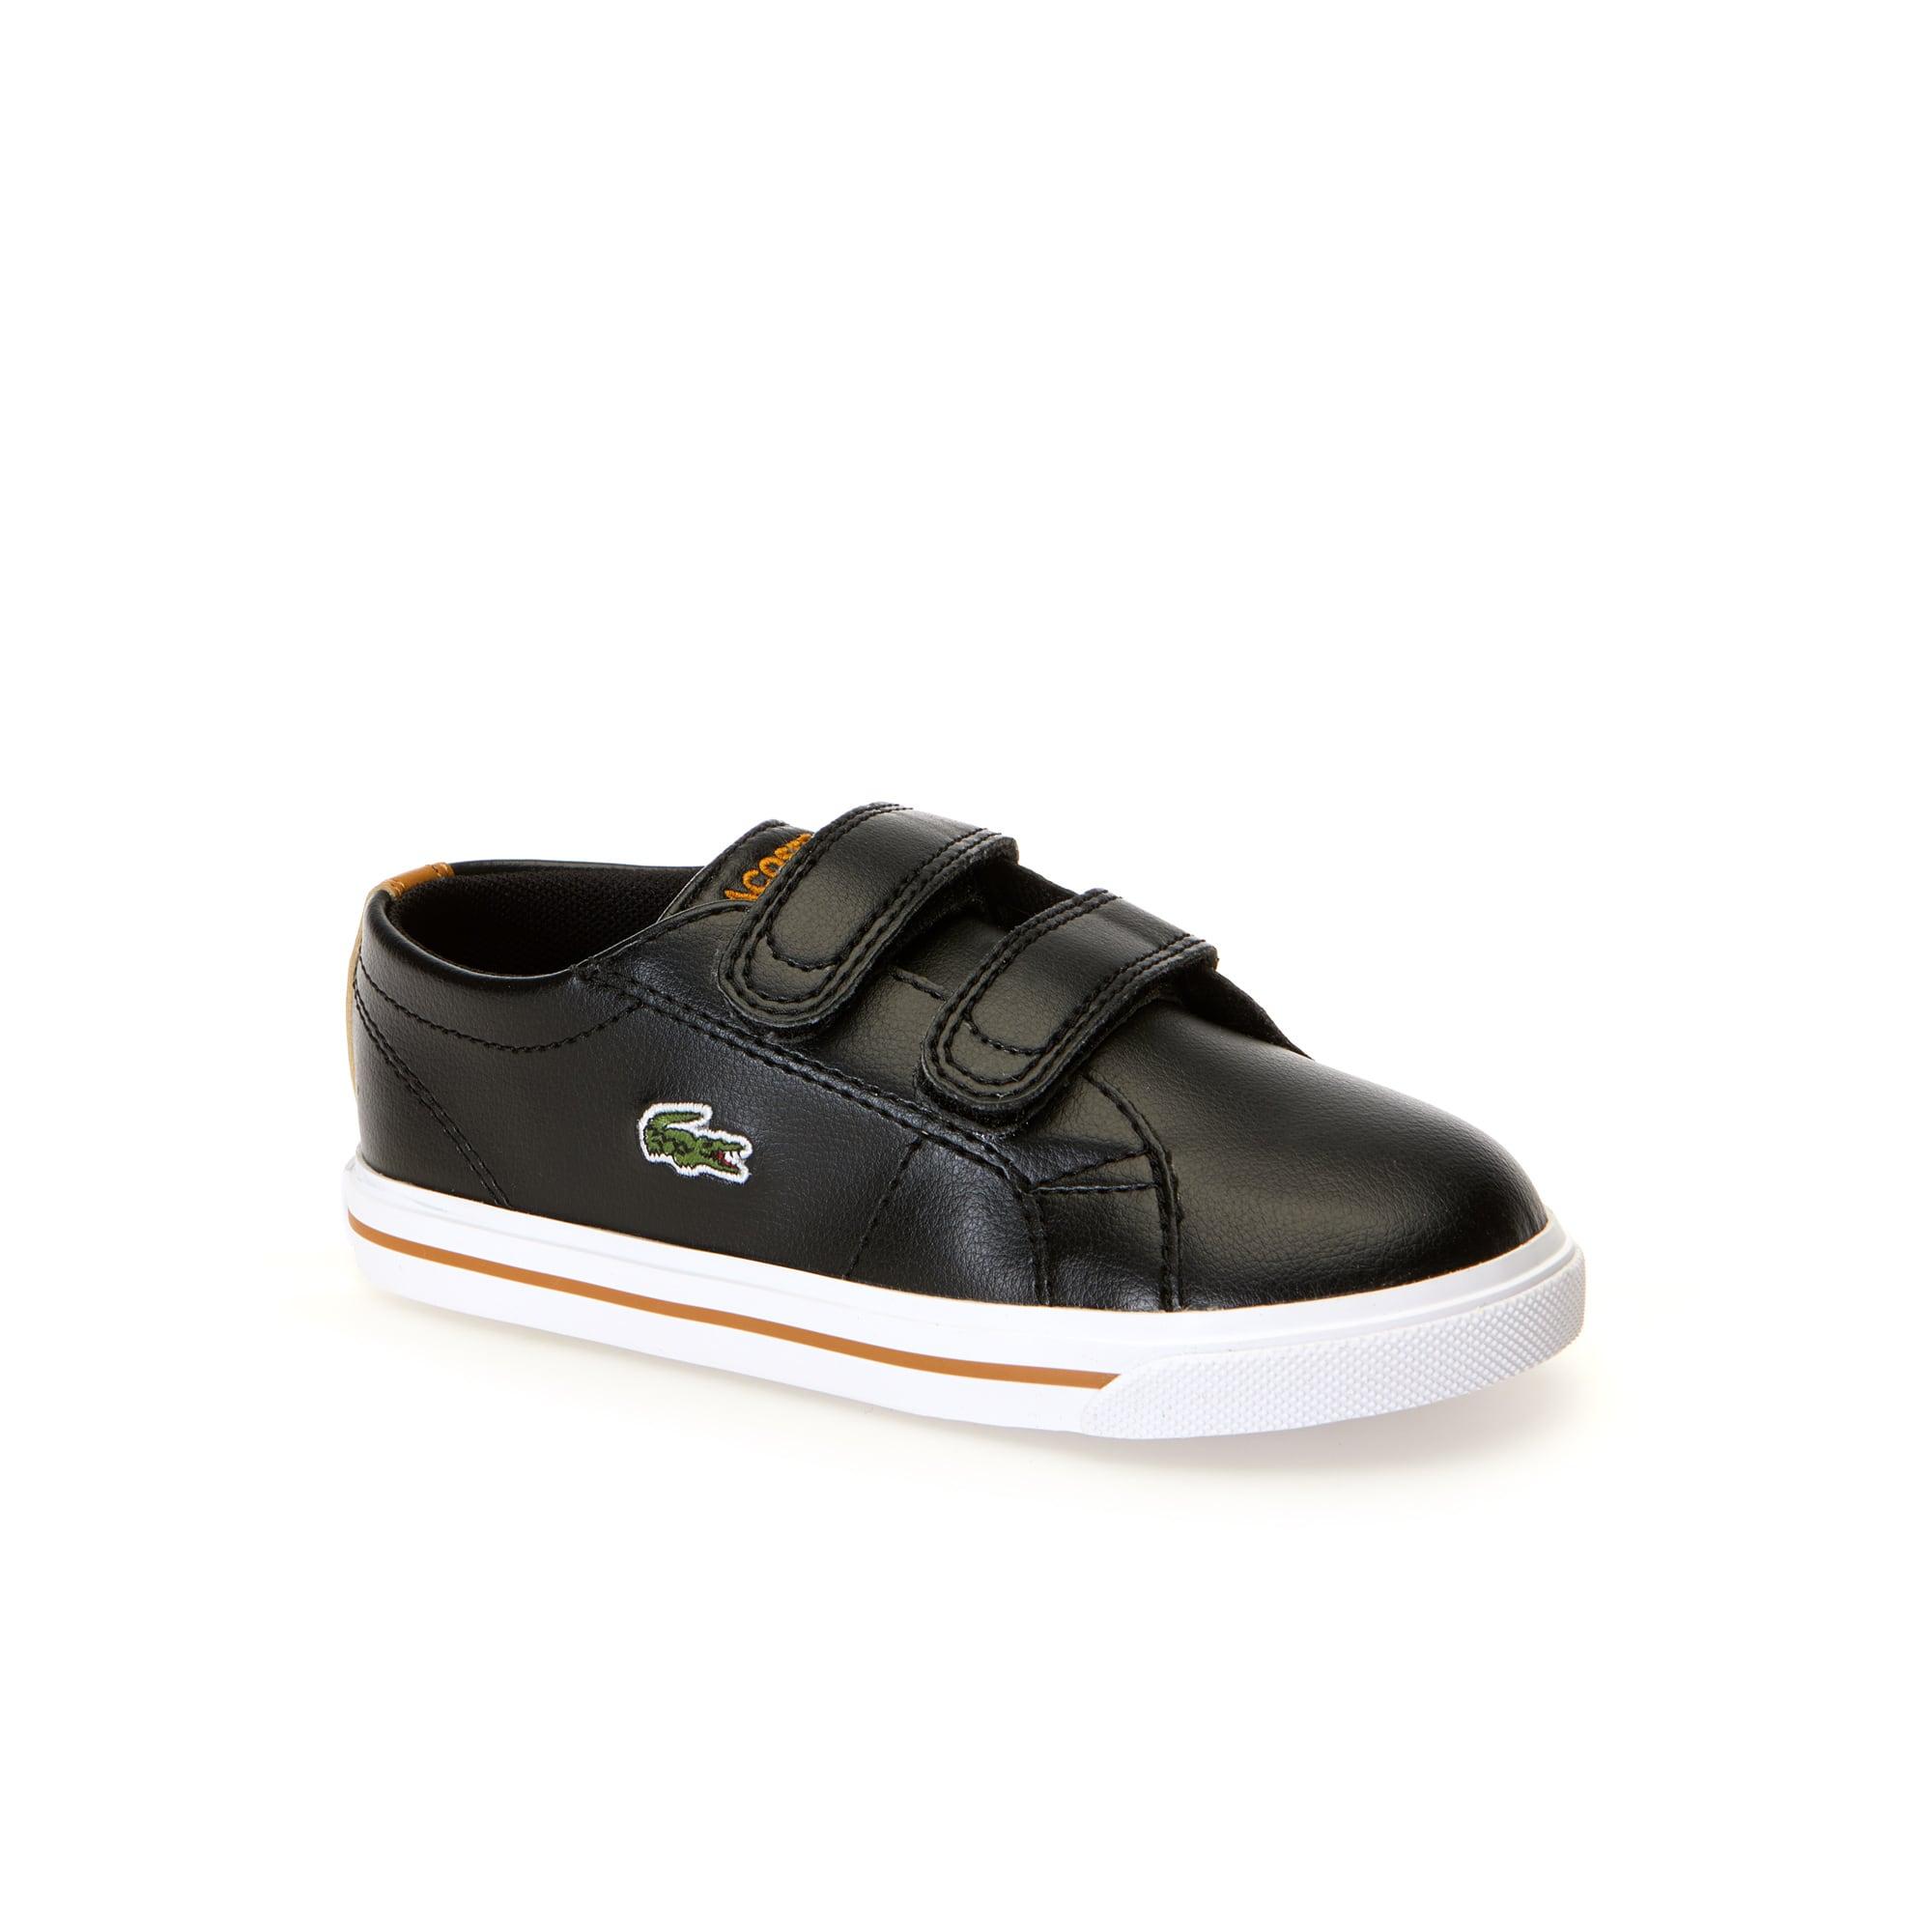 Zapatillas de niño Riberac de material textil